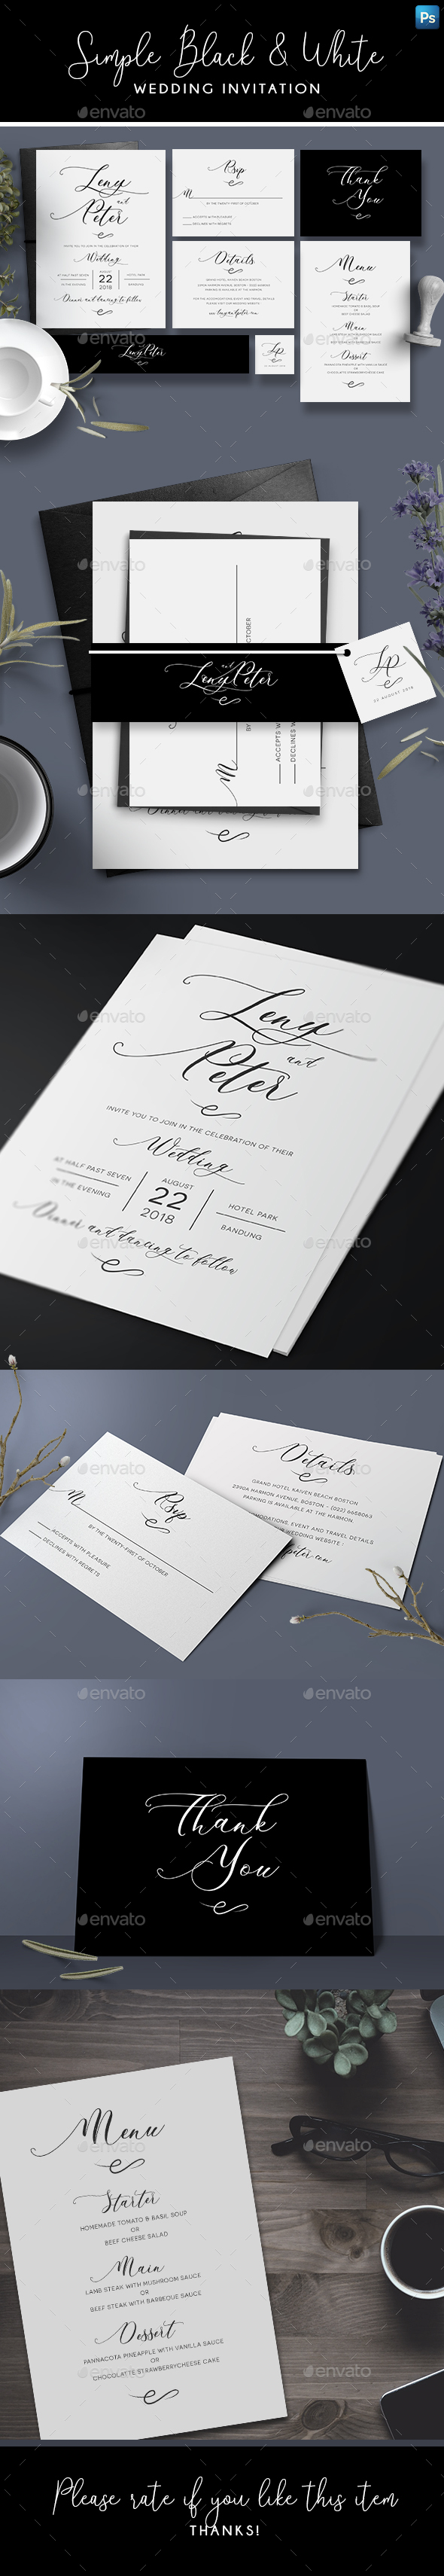 Simple Black & White Invitation - Wedding Greeting Cards